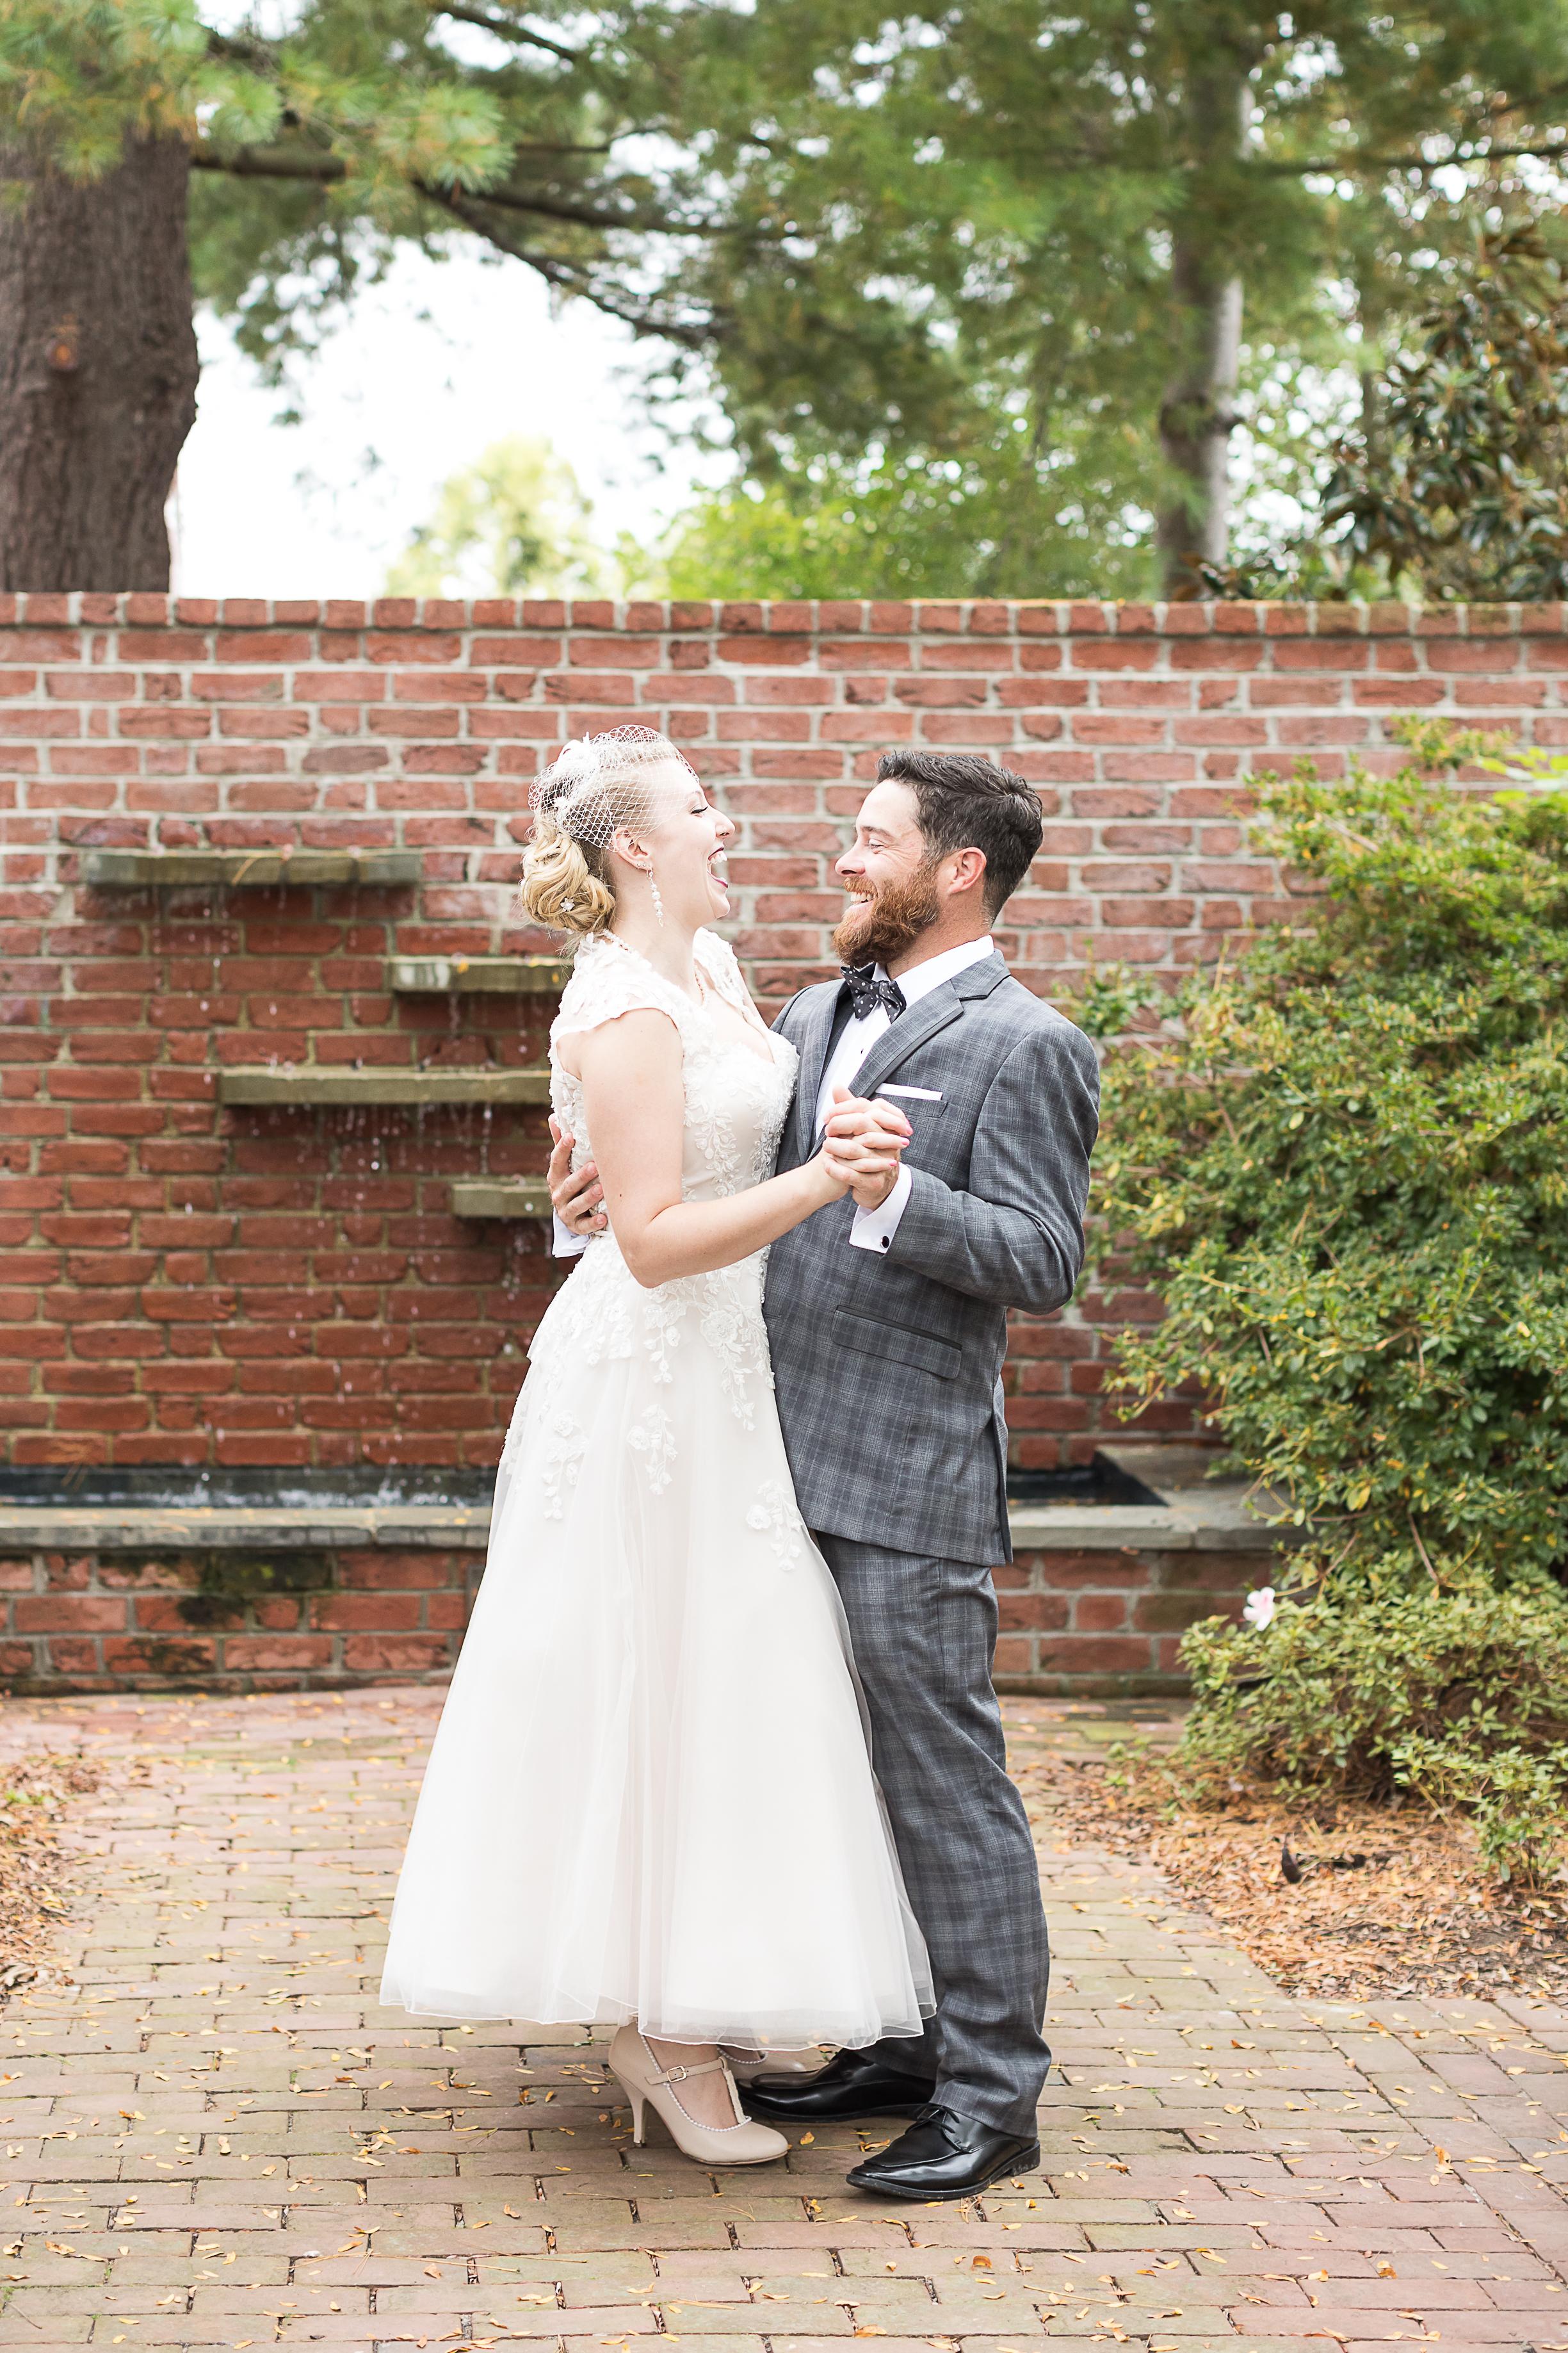 20-01-03-Ashleigh-RJ-Wedding-Kim-Pham-Clark-Photography.jpg